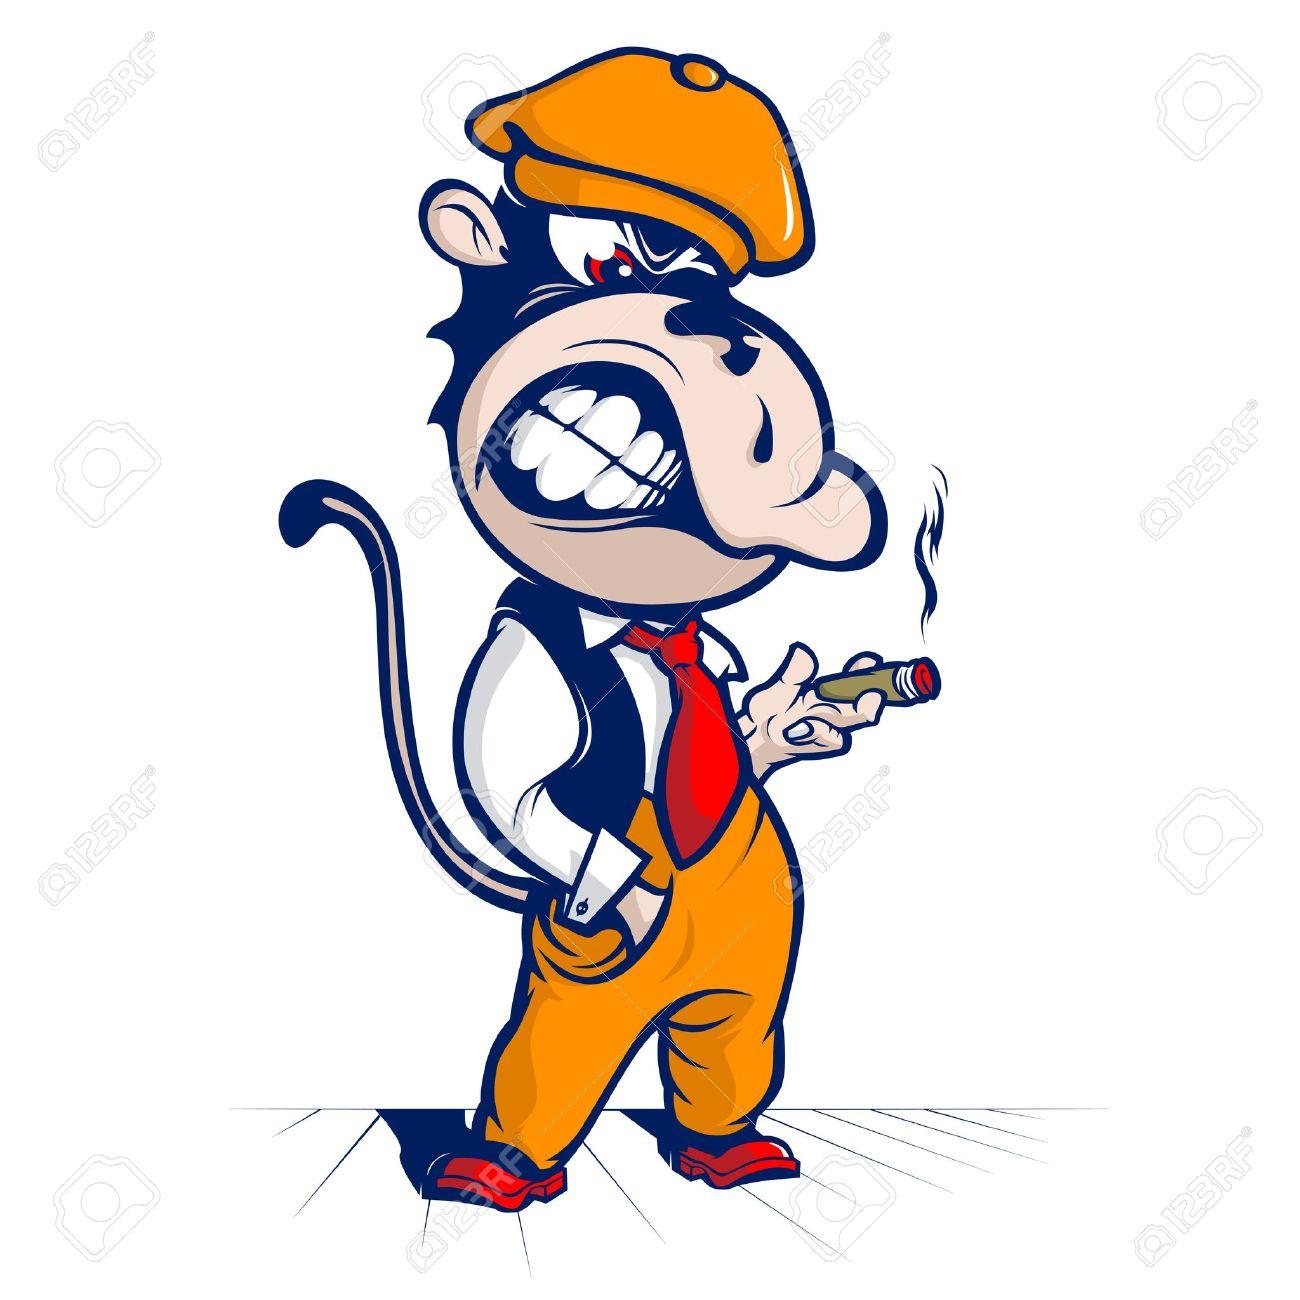 cartoon monkey smoke and smile - 12788153